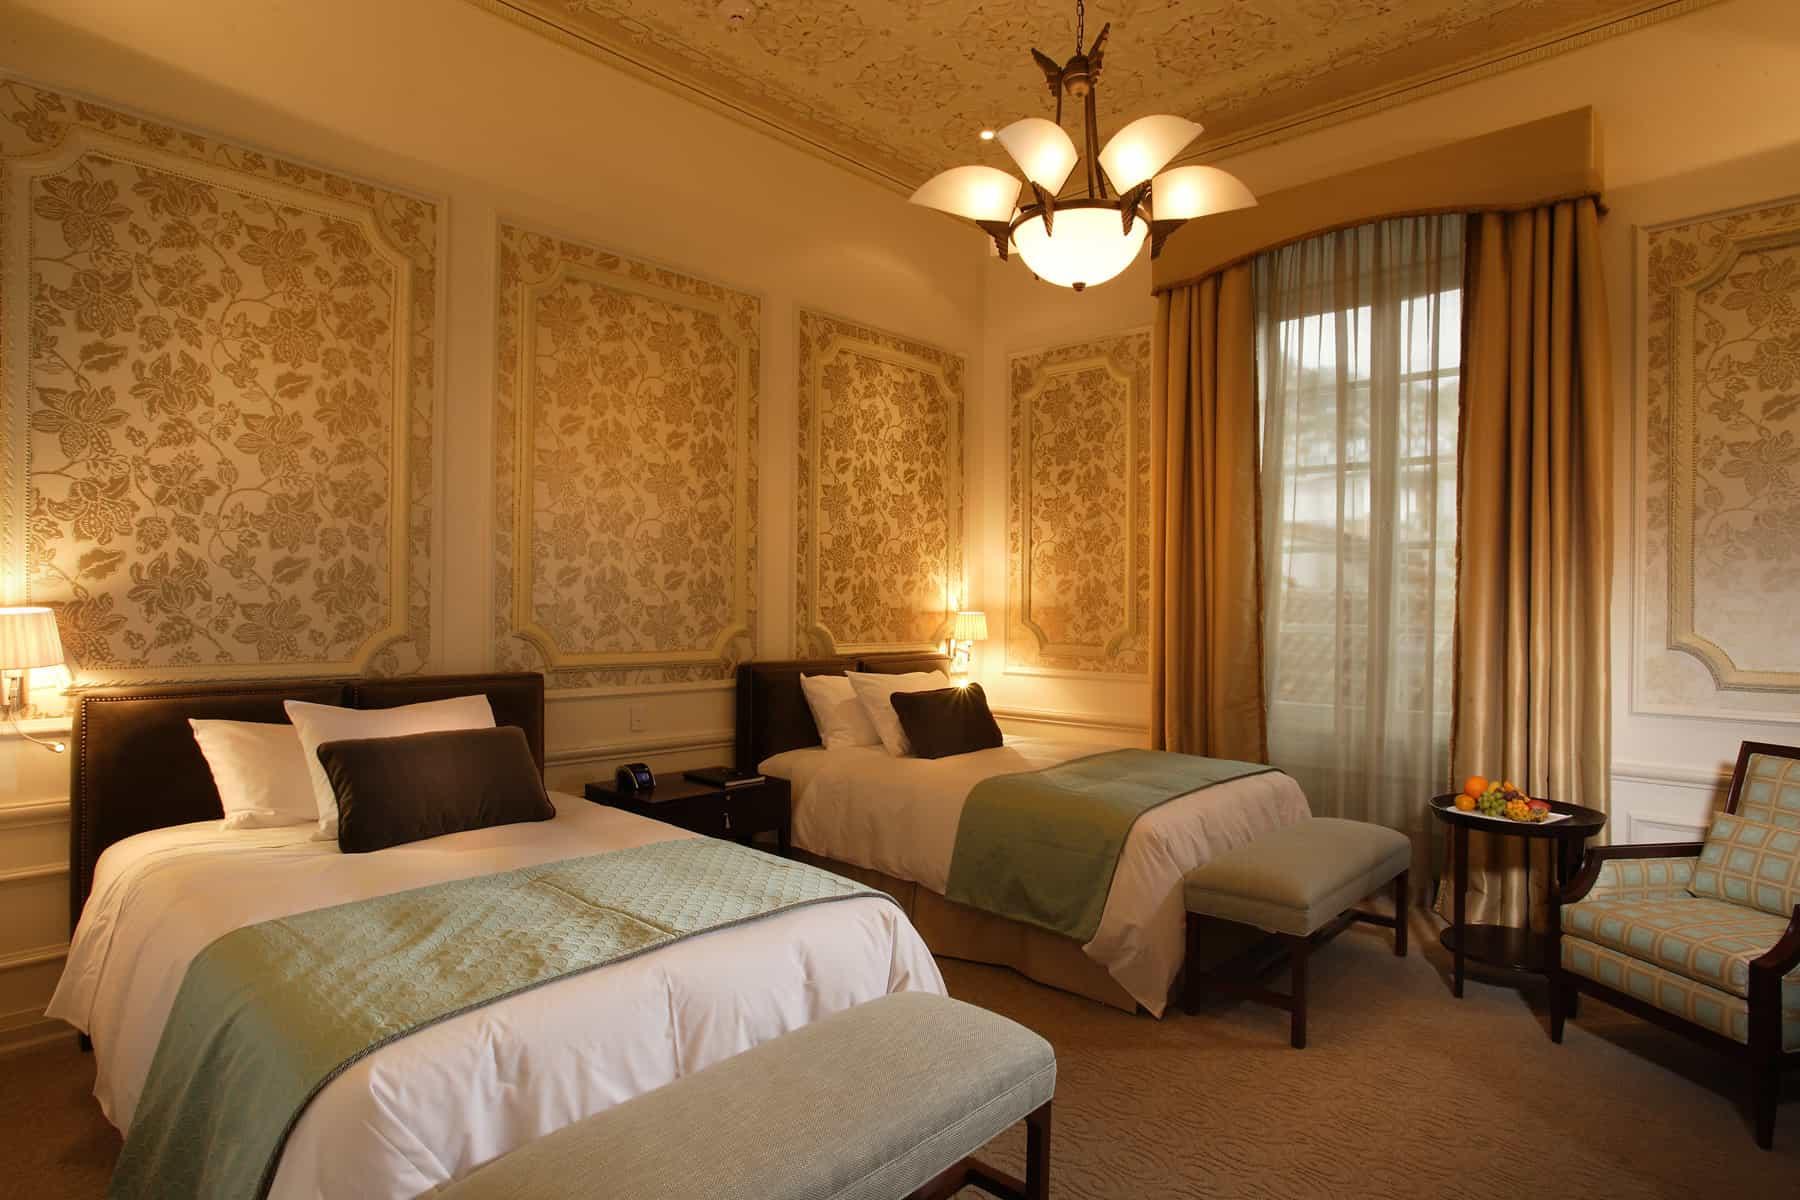 rooms - casa-gangotena-rooms-luxury-room.jpg